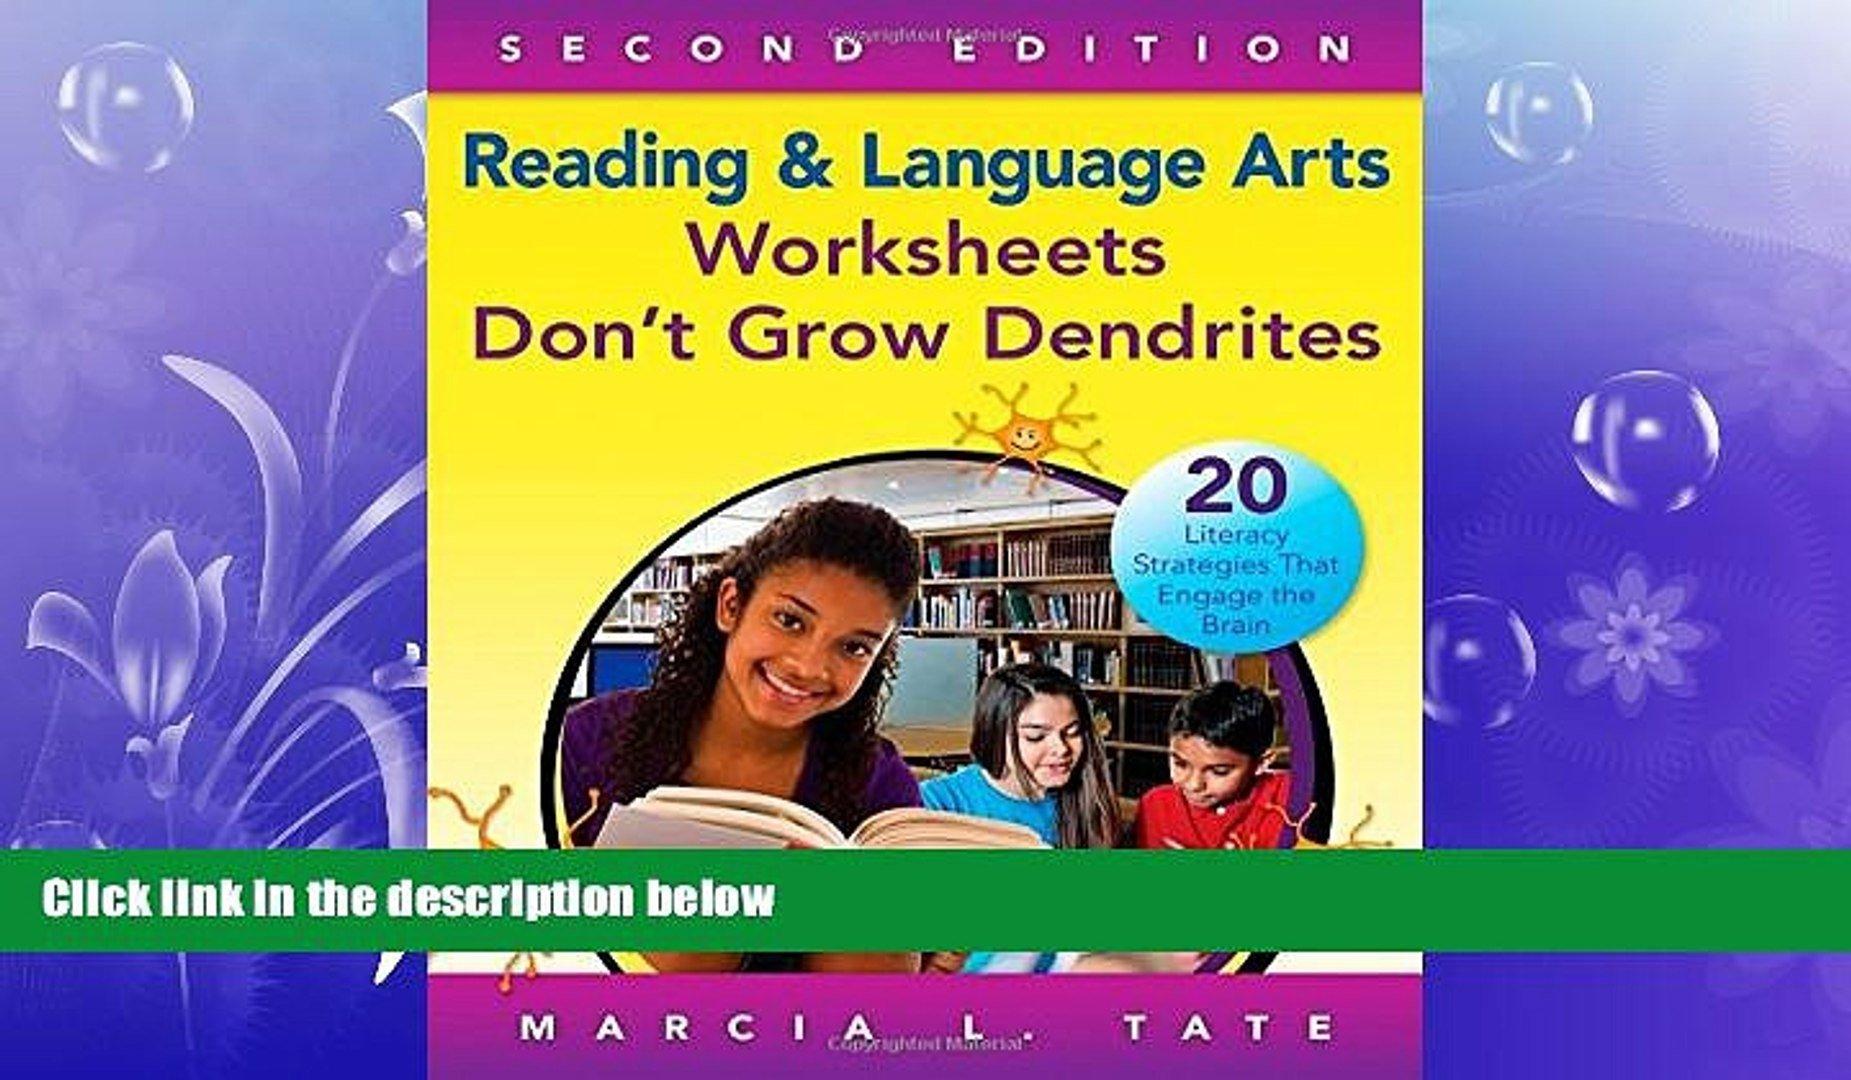 Free Pdf Downlaod Reading And Language Arts Worksheets Don T Grow As Well As Worksheets Don T Grow Dendrites Pdf